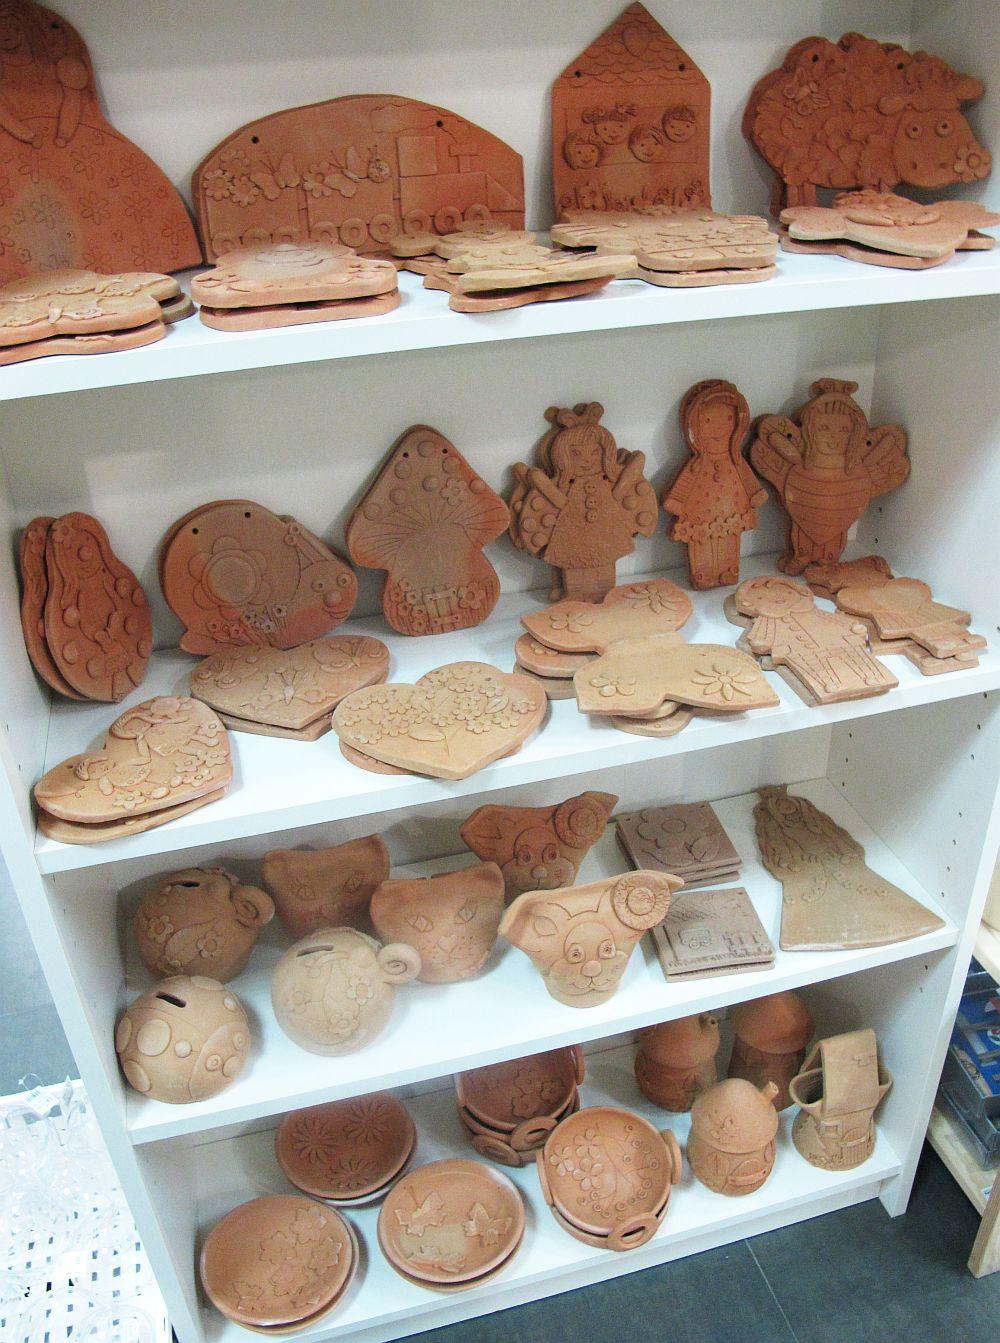 adelaparvu.com about Colorit new art&crafts shop in Bucharest (14)